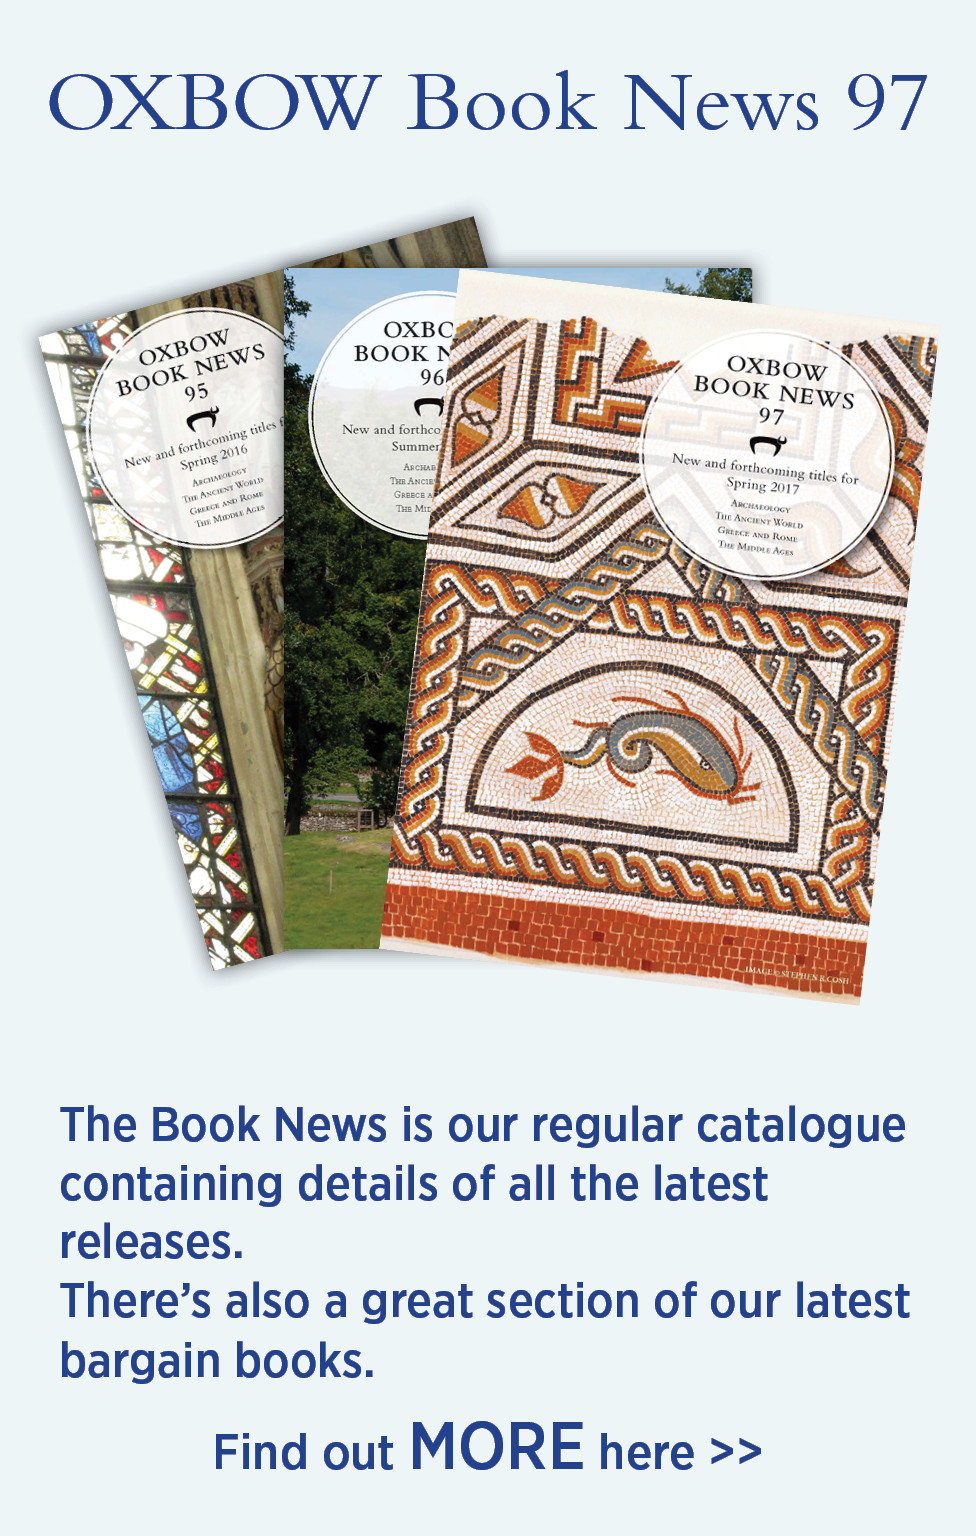 Oxbow Book News 97